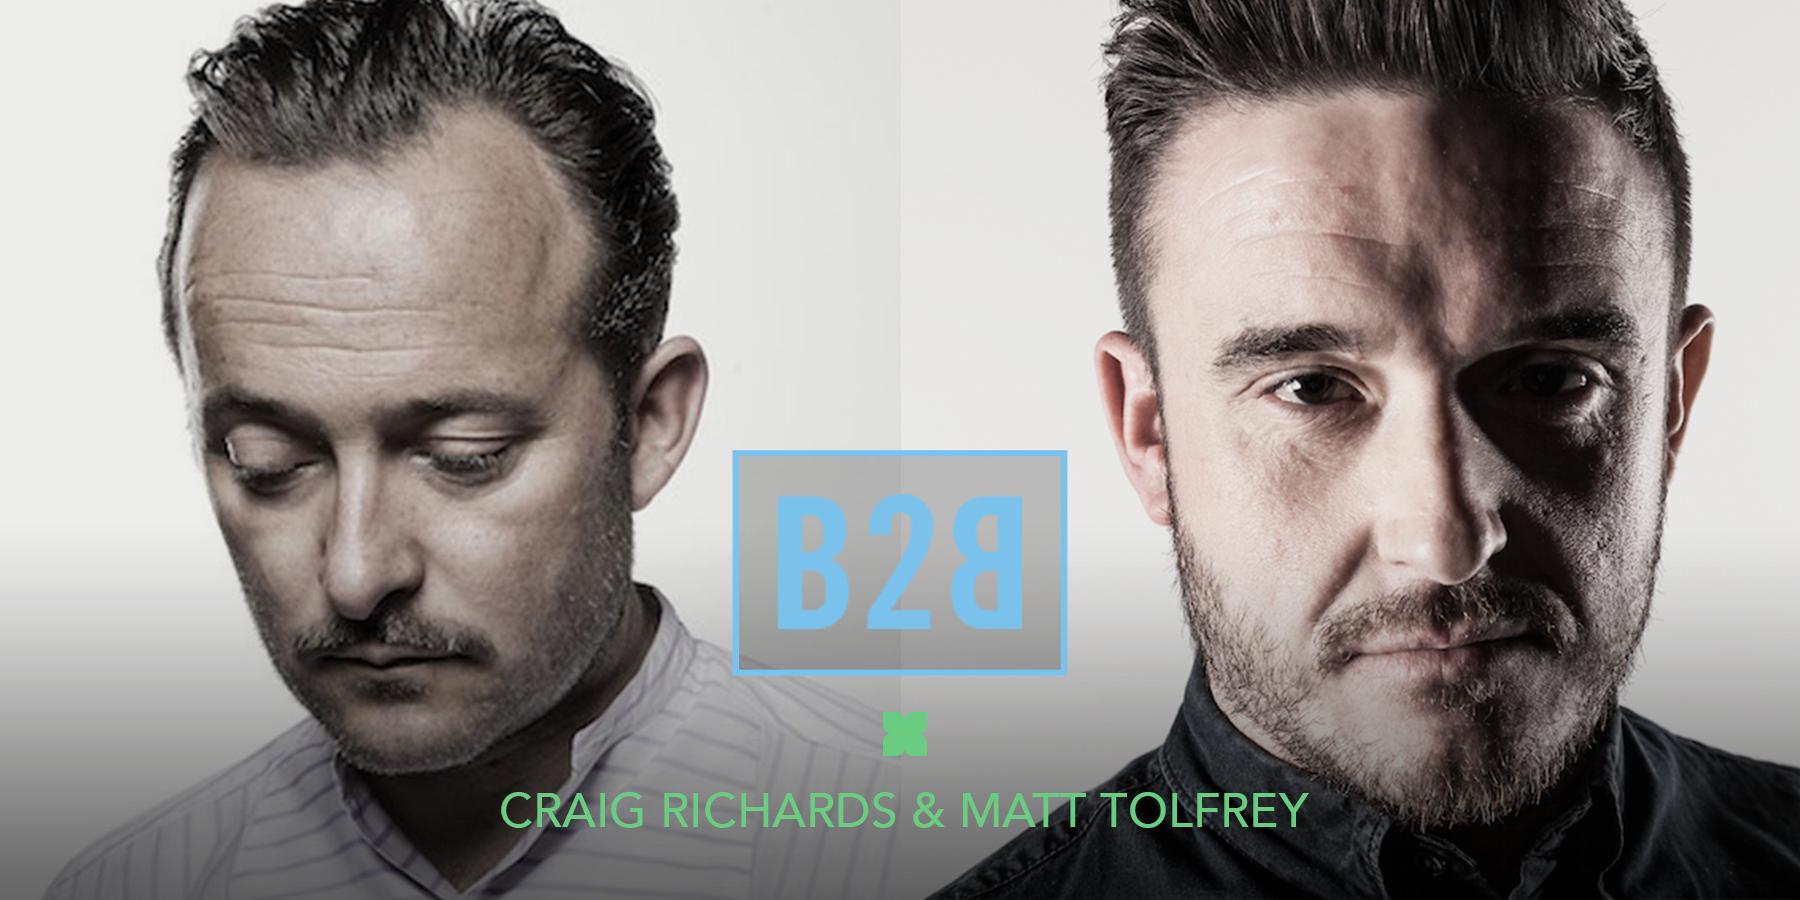 Craig Richards and Matt Tolfrey